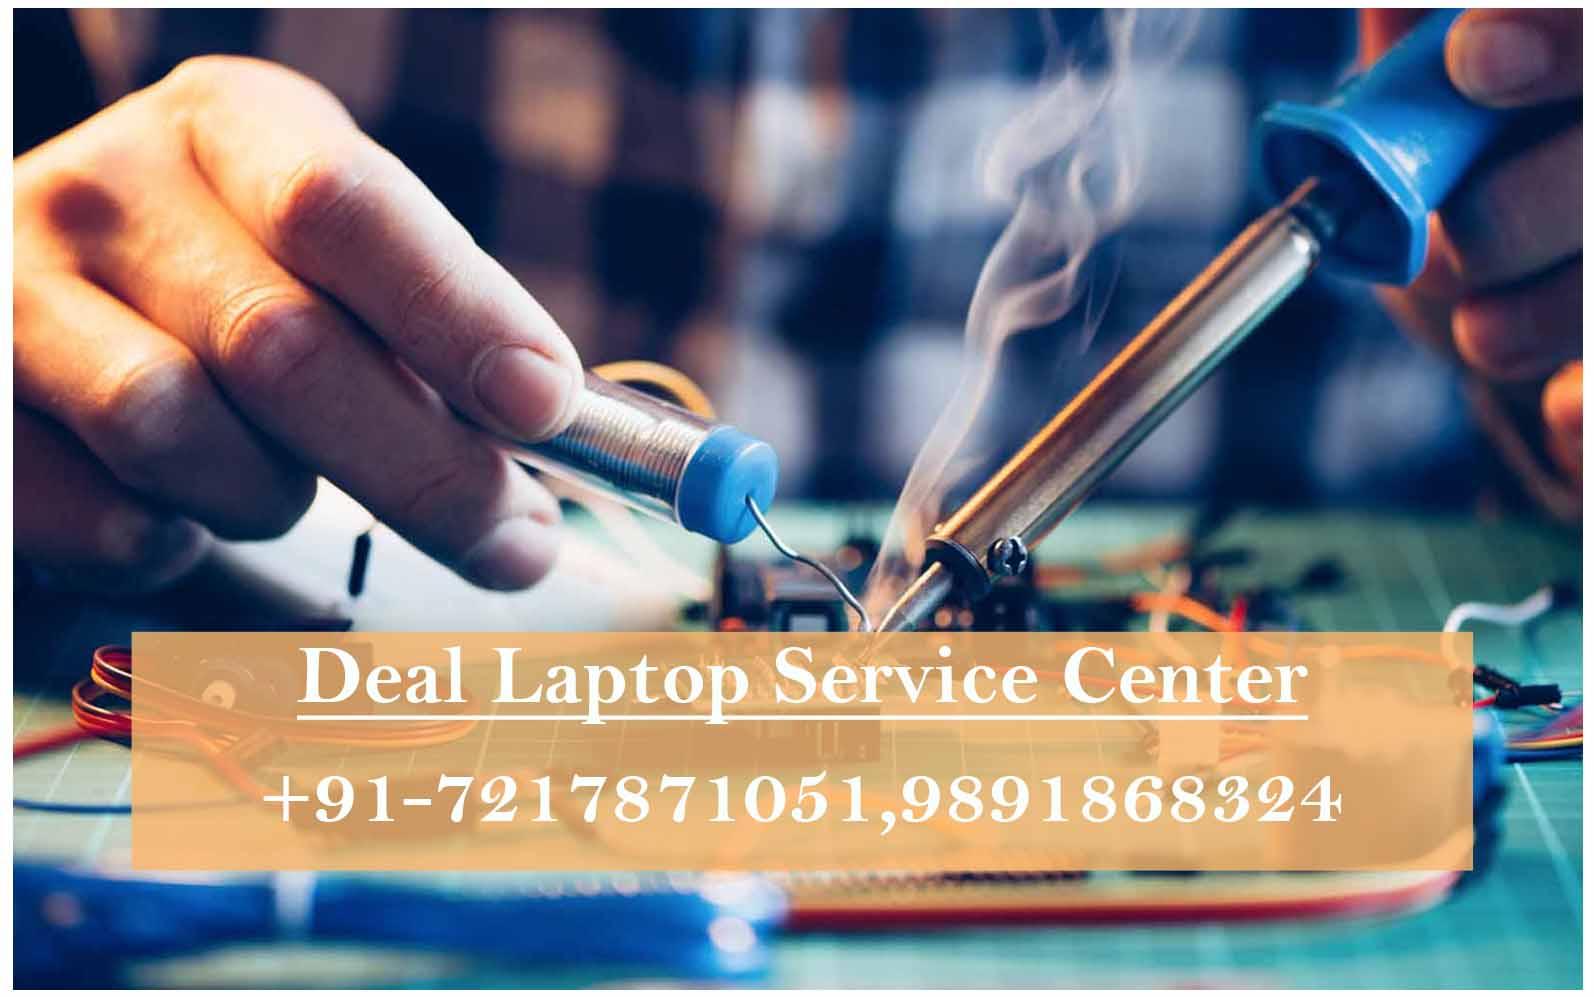 Dell service center in Greater Noida